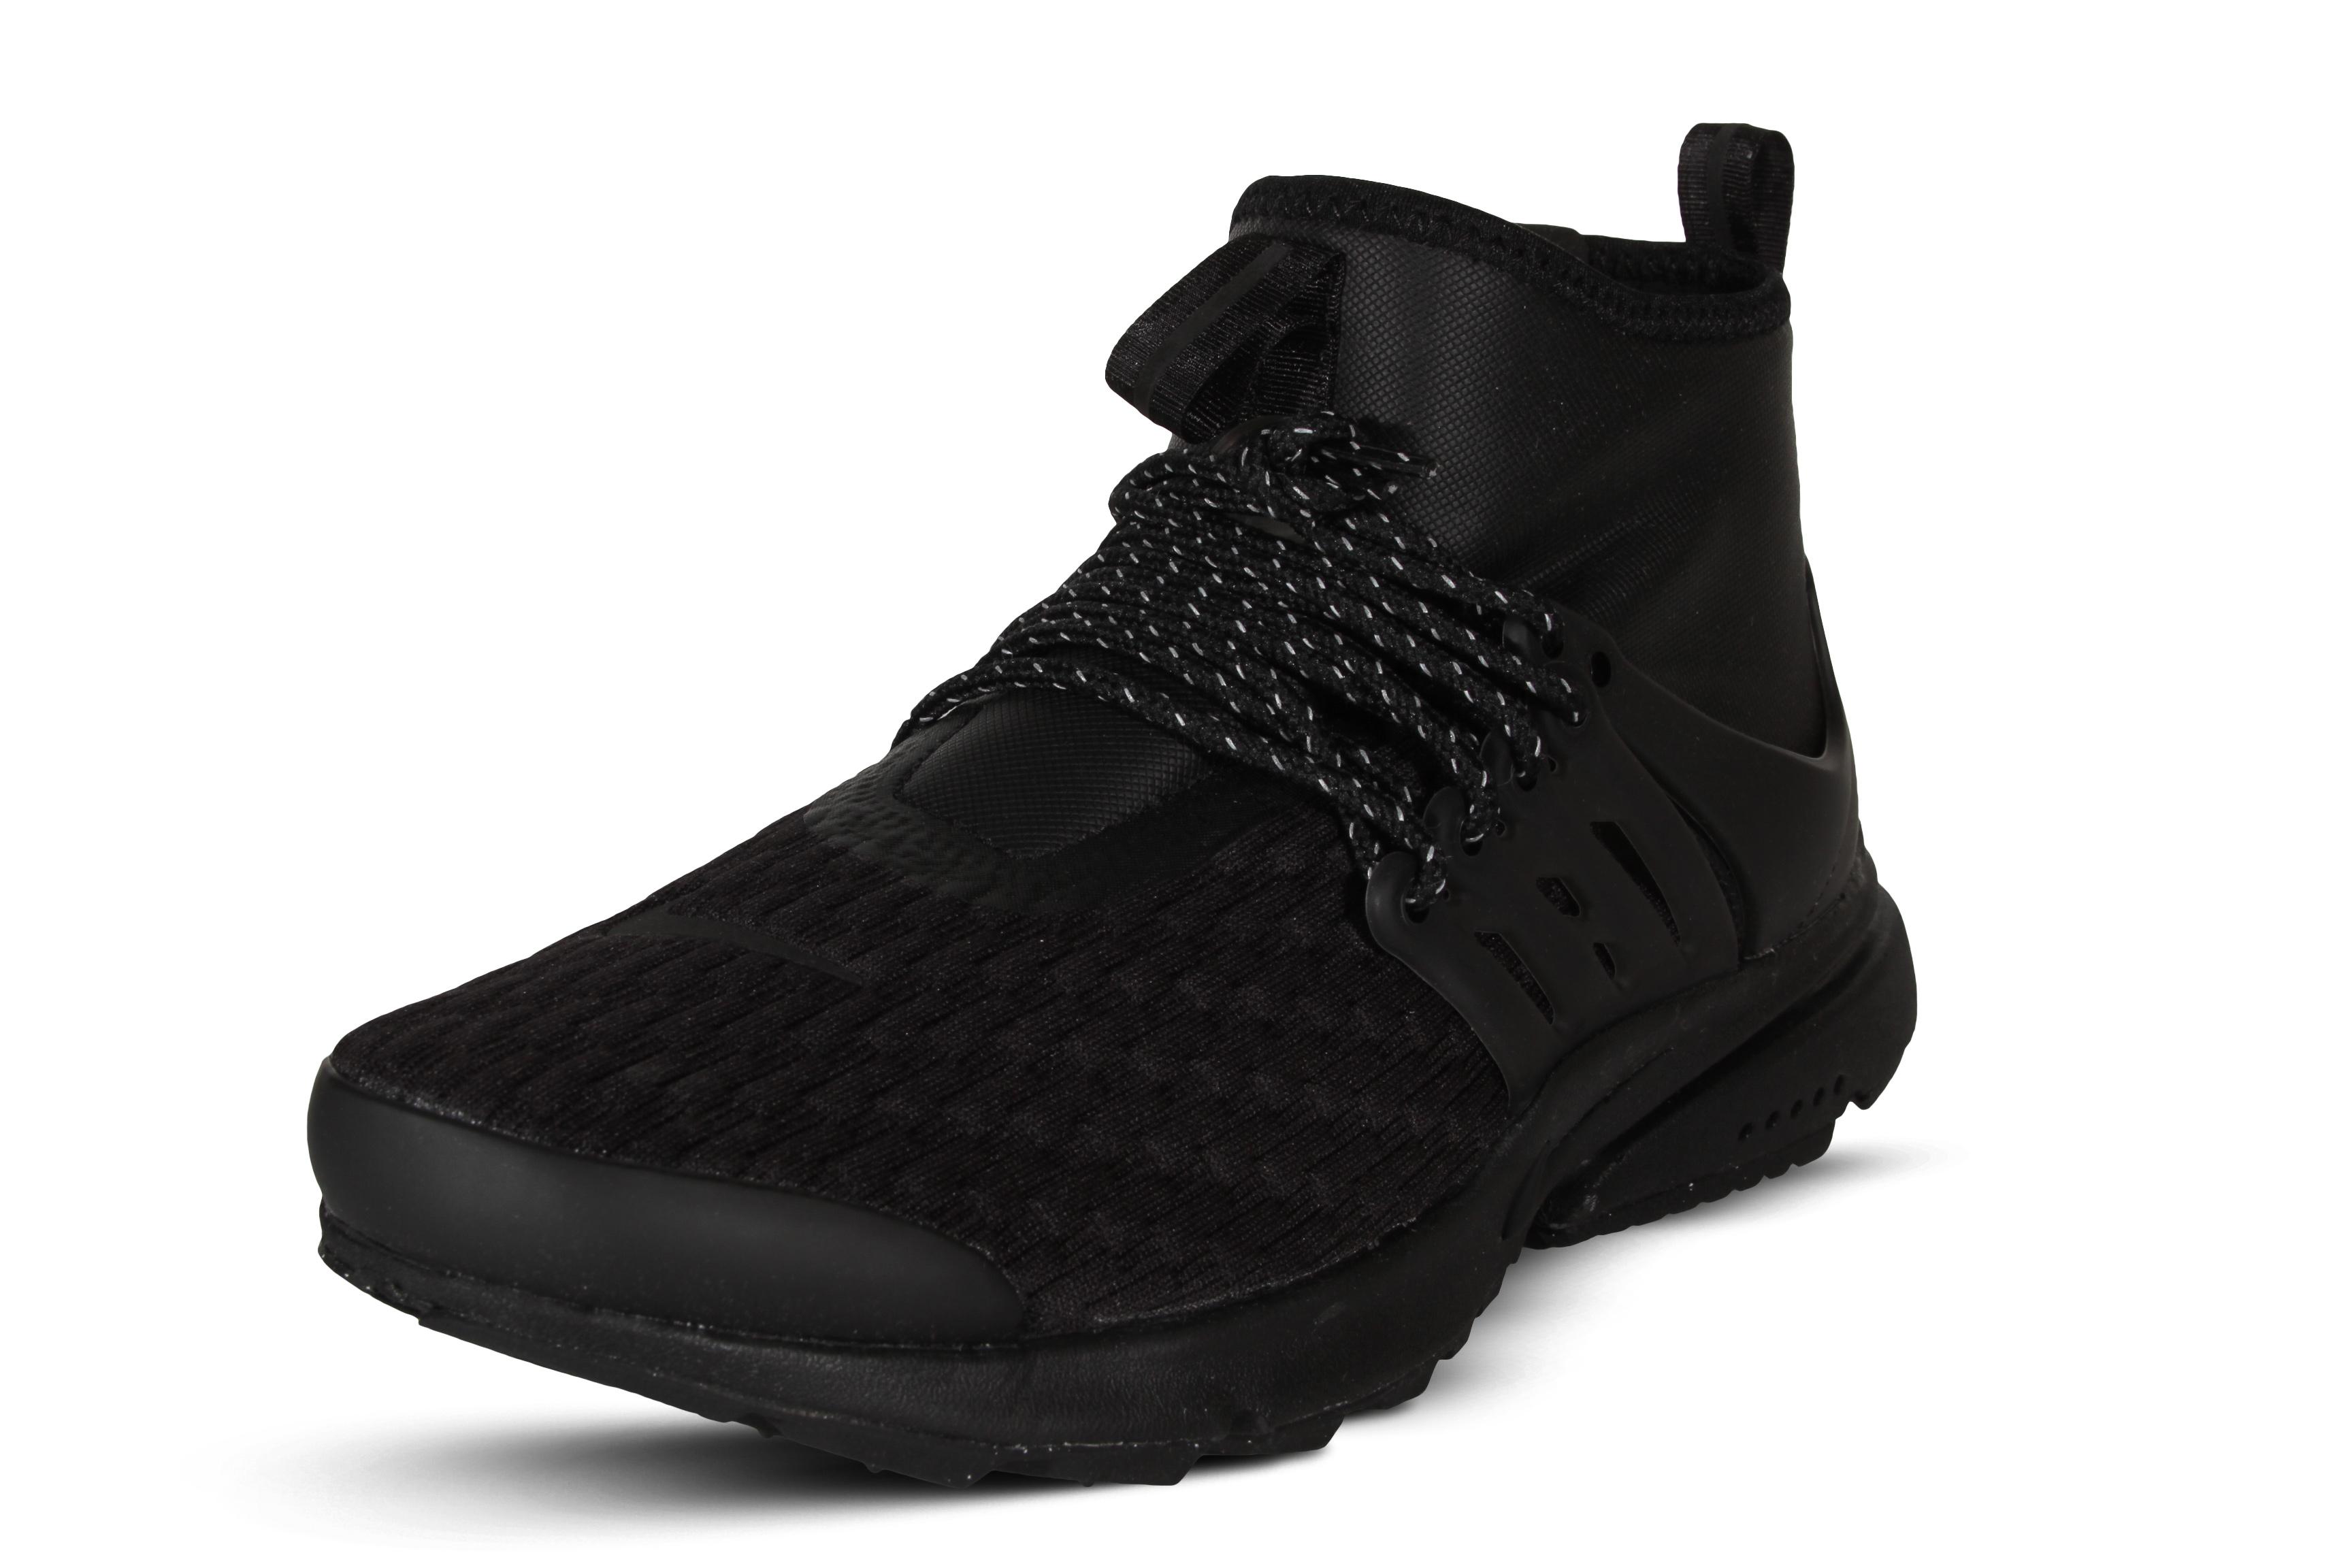 new arrival 4ff86 44c7b ... ebay womens nike air presto mid utility premium running shoes aa0674  003 1a651 c9efb